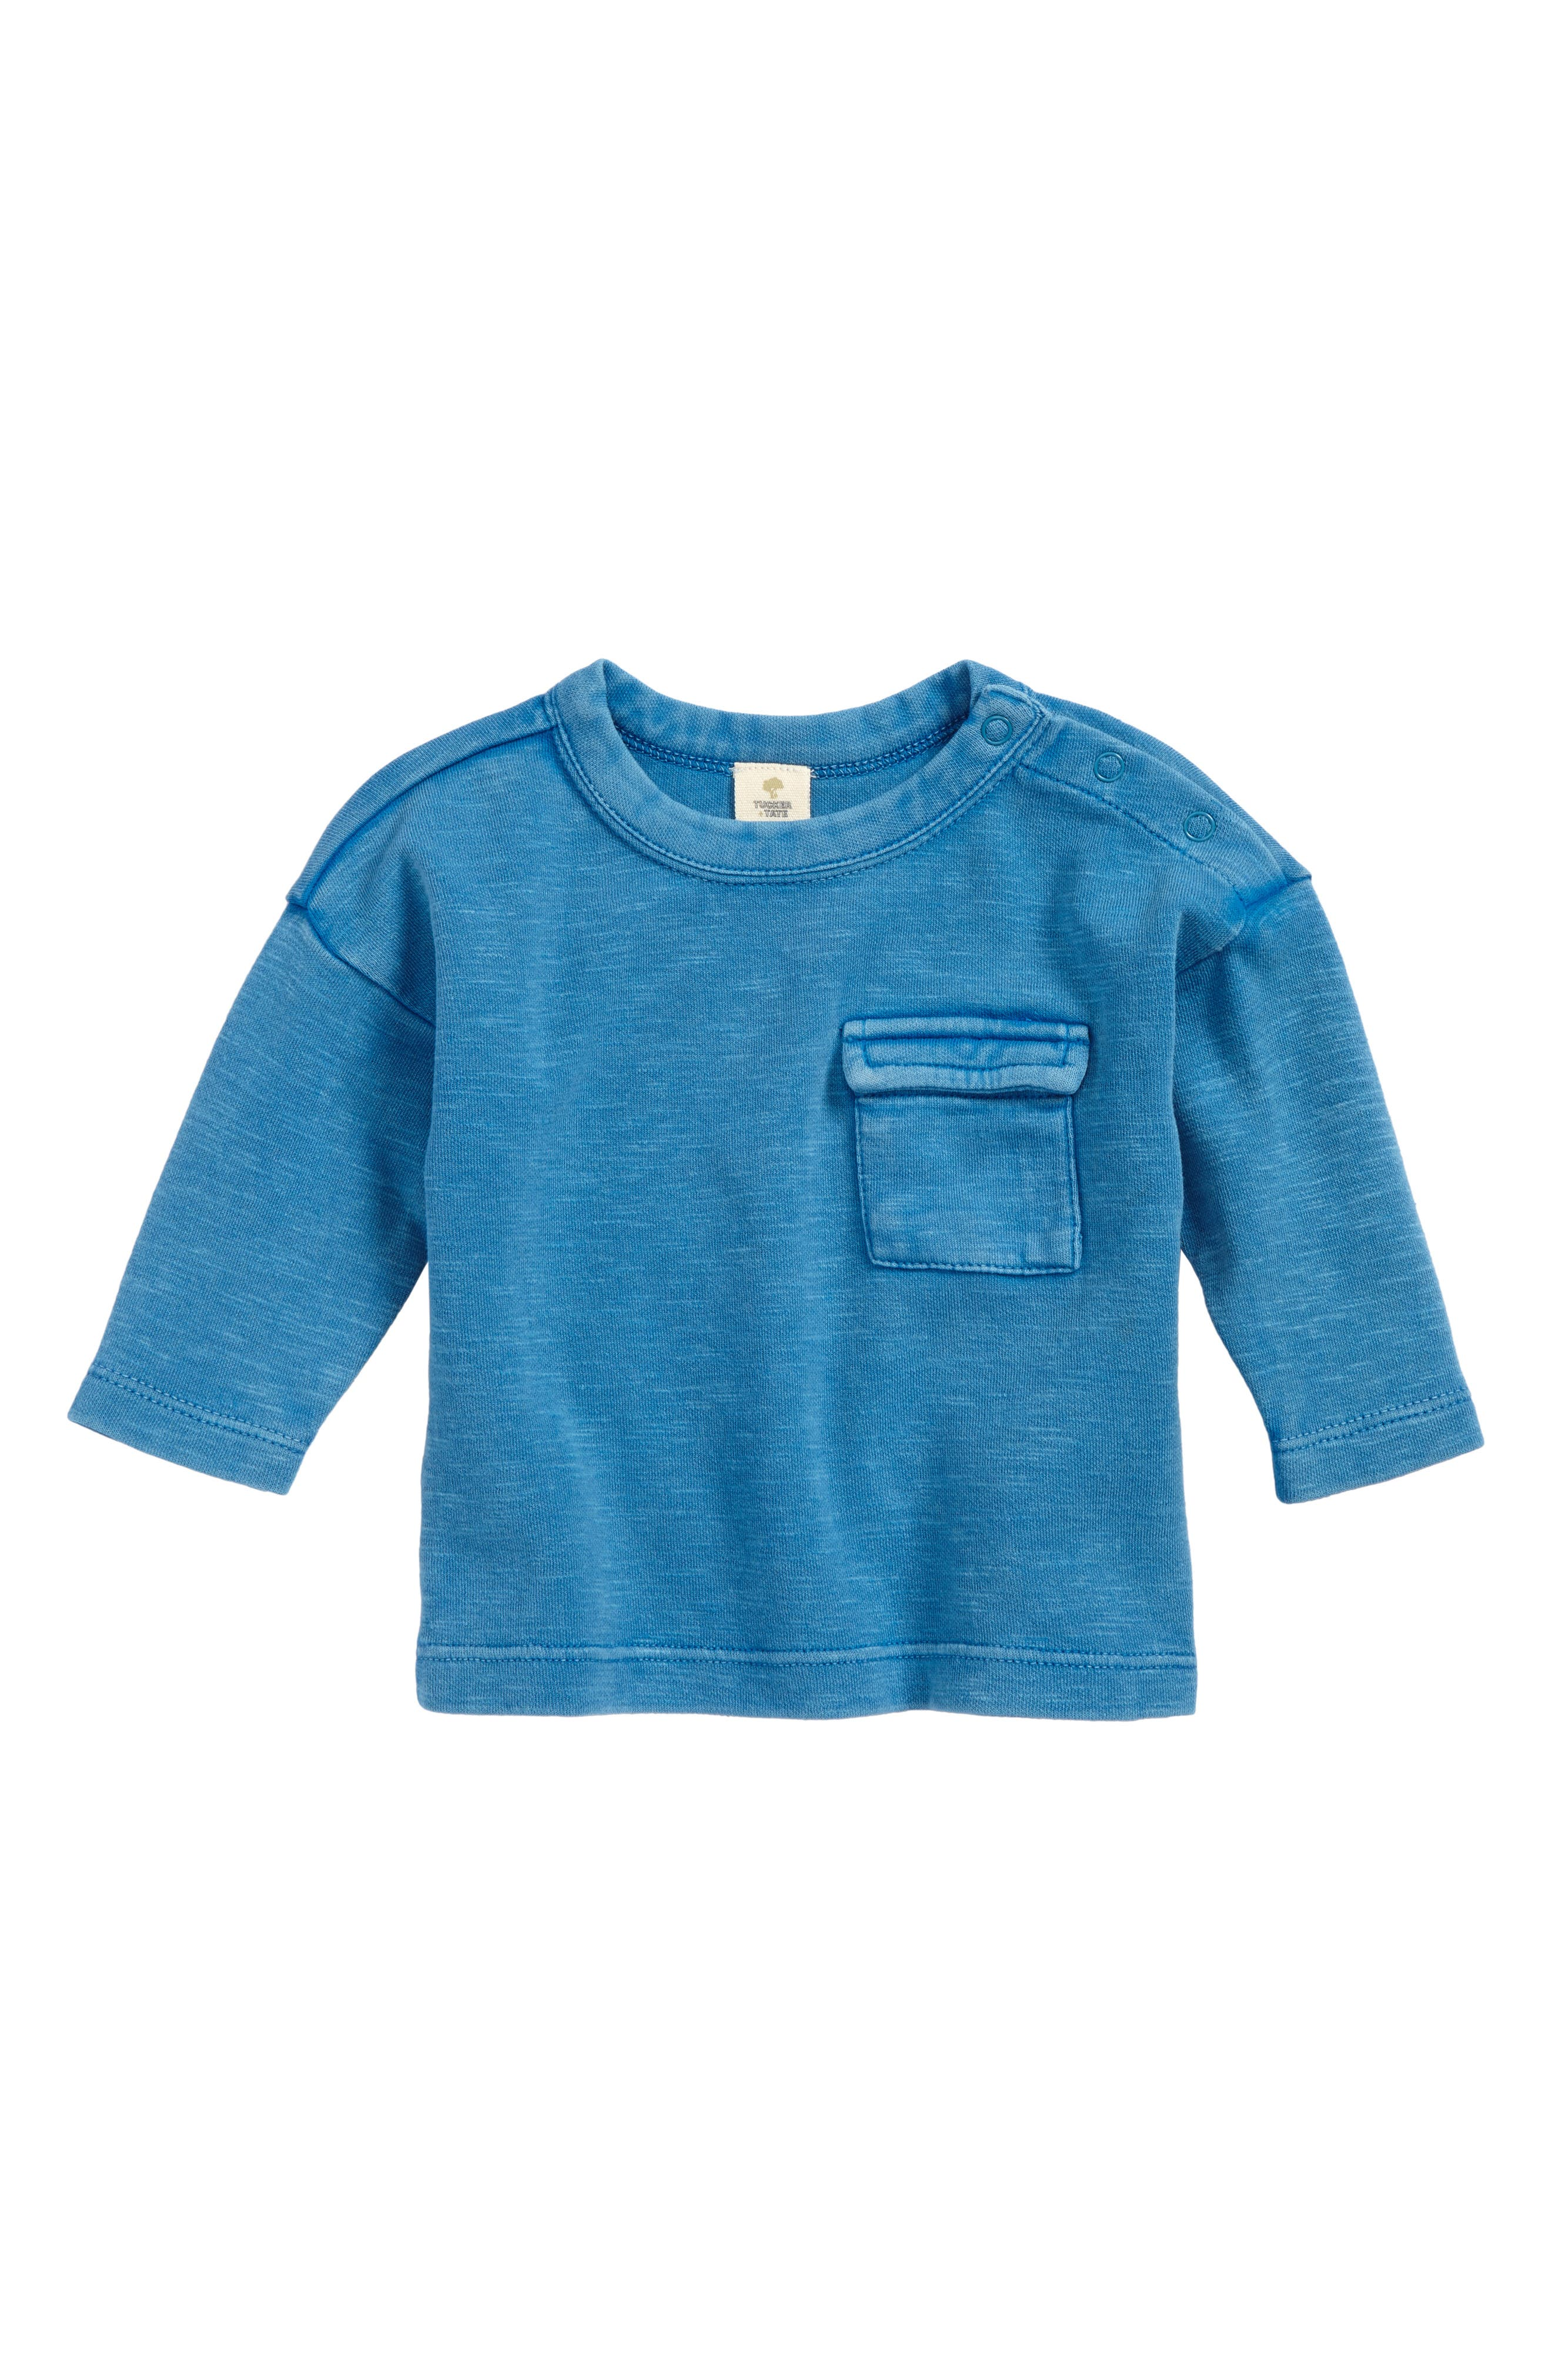 Drop Shoulder T-Shirt,                             Main thumbnail 1, color,                             450